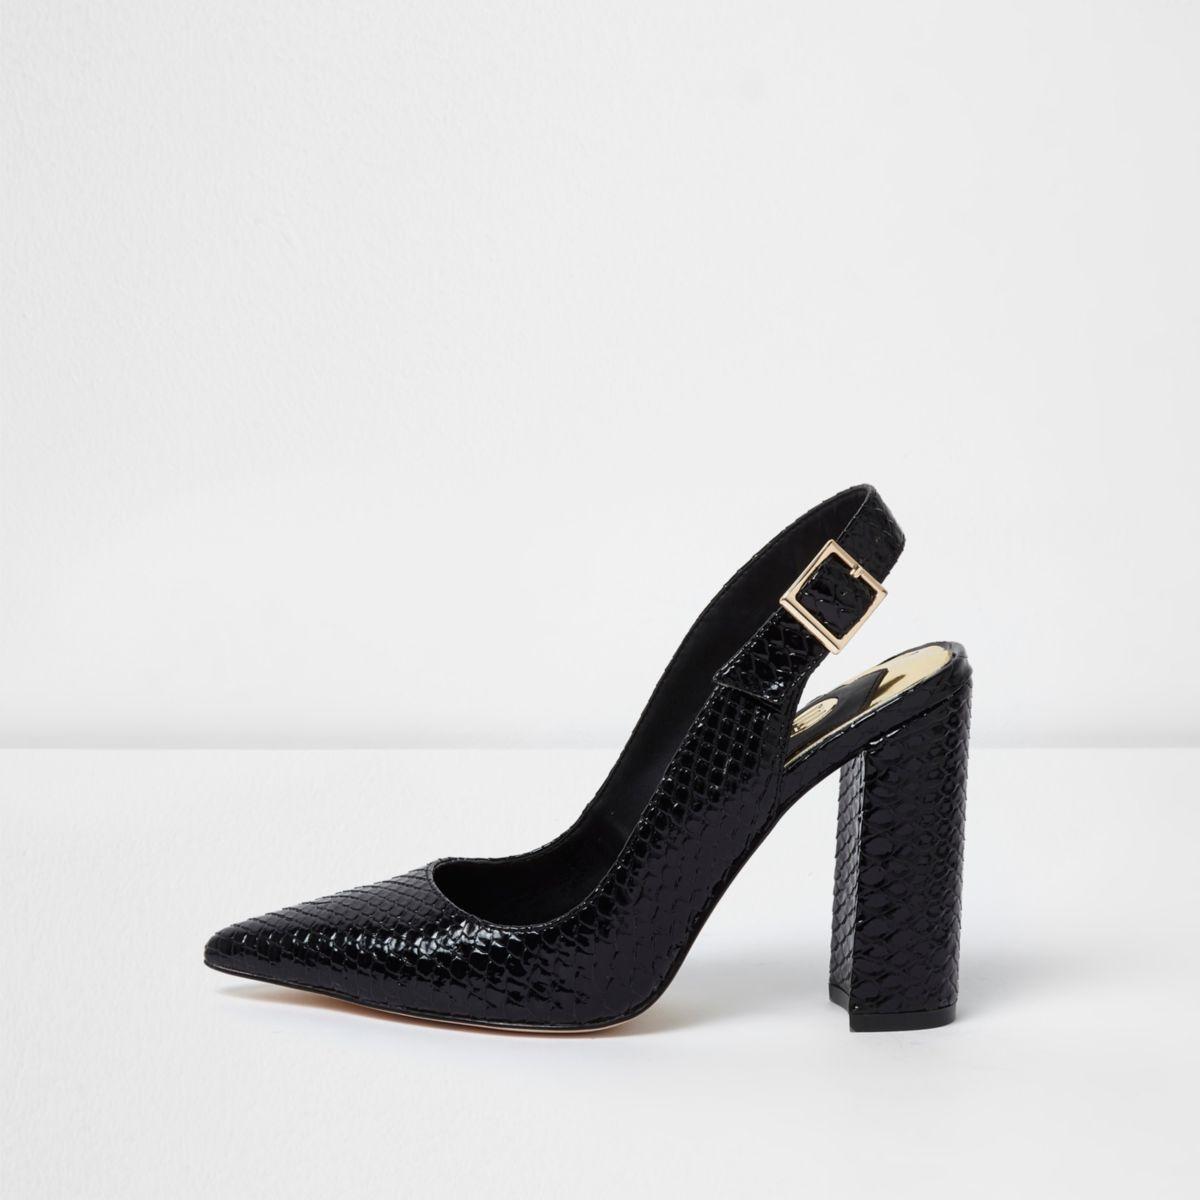 Black snake slingback block heel court shoes